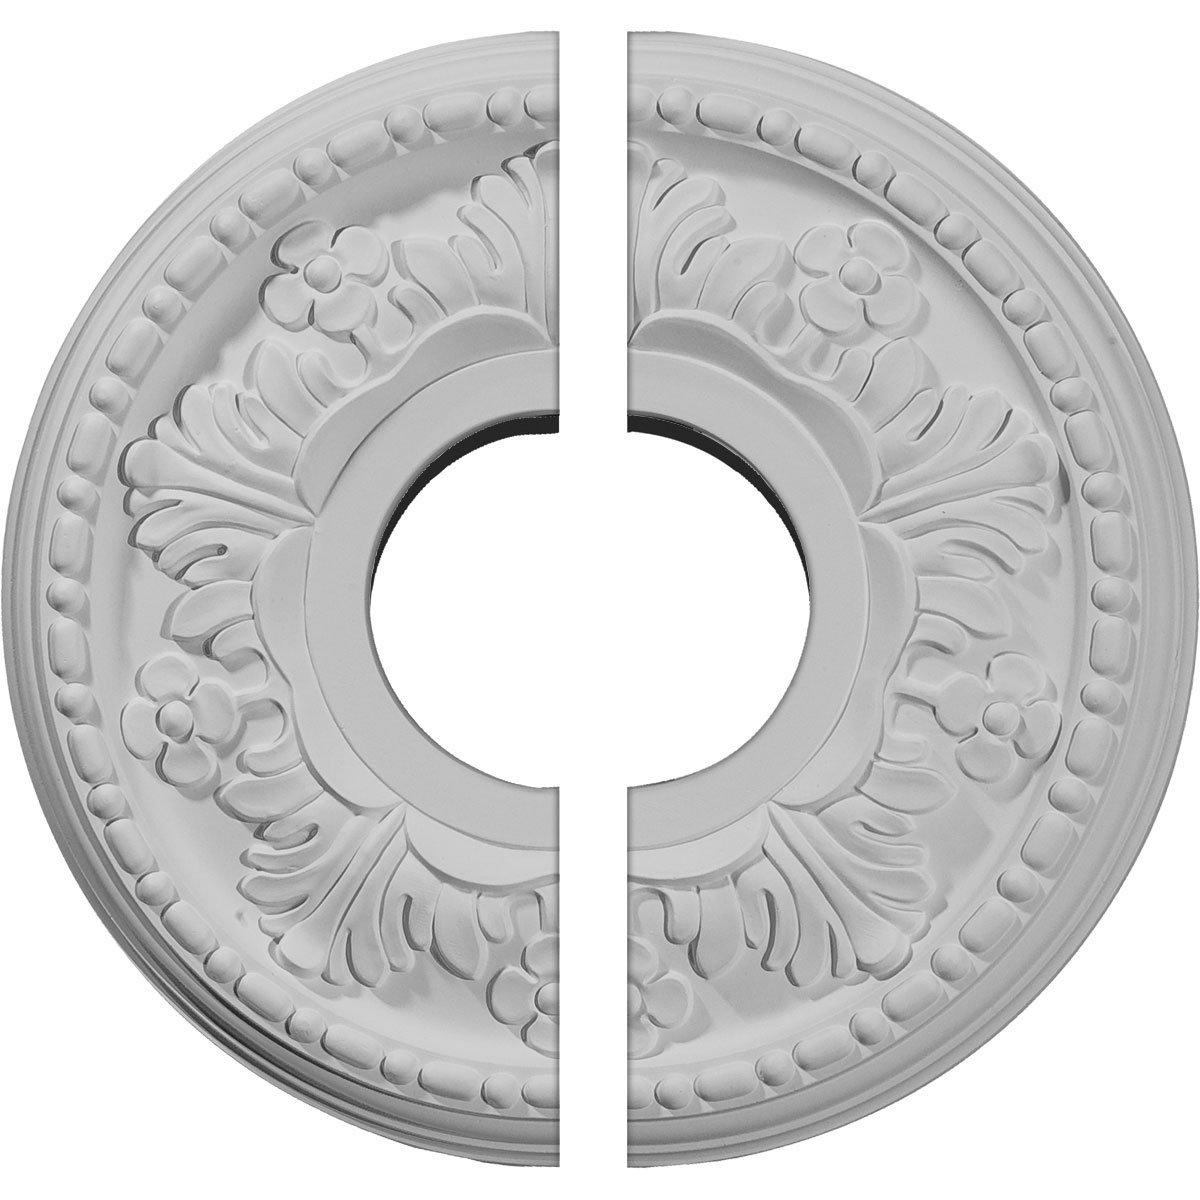 Ekena Millwork CM11HE2 11 7/8''OD x 3 5/8''ID x 7/8''P Helene Ceiling Medallion, Fits Canopies up to 5-1/4'', 2 Piece